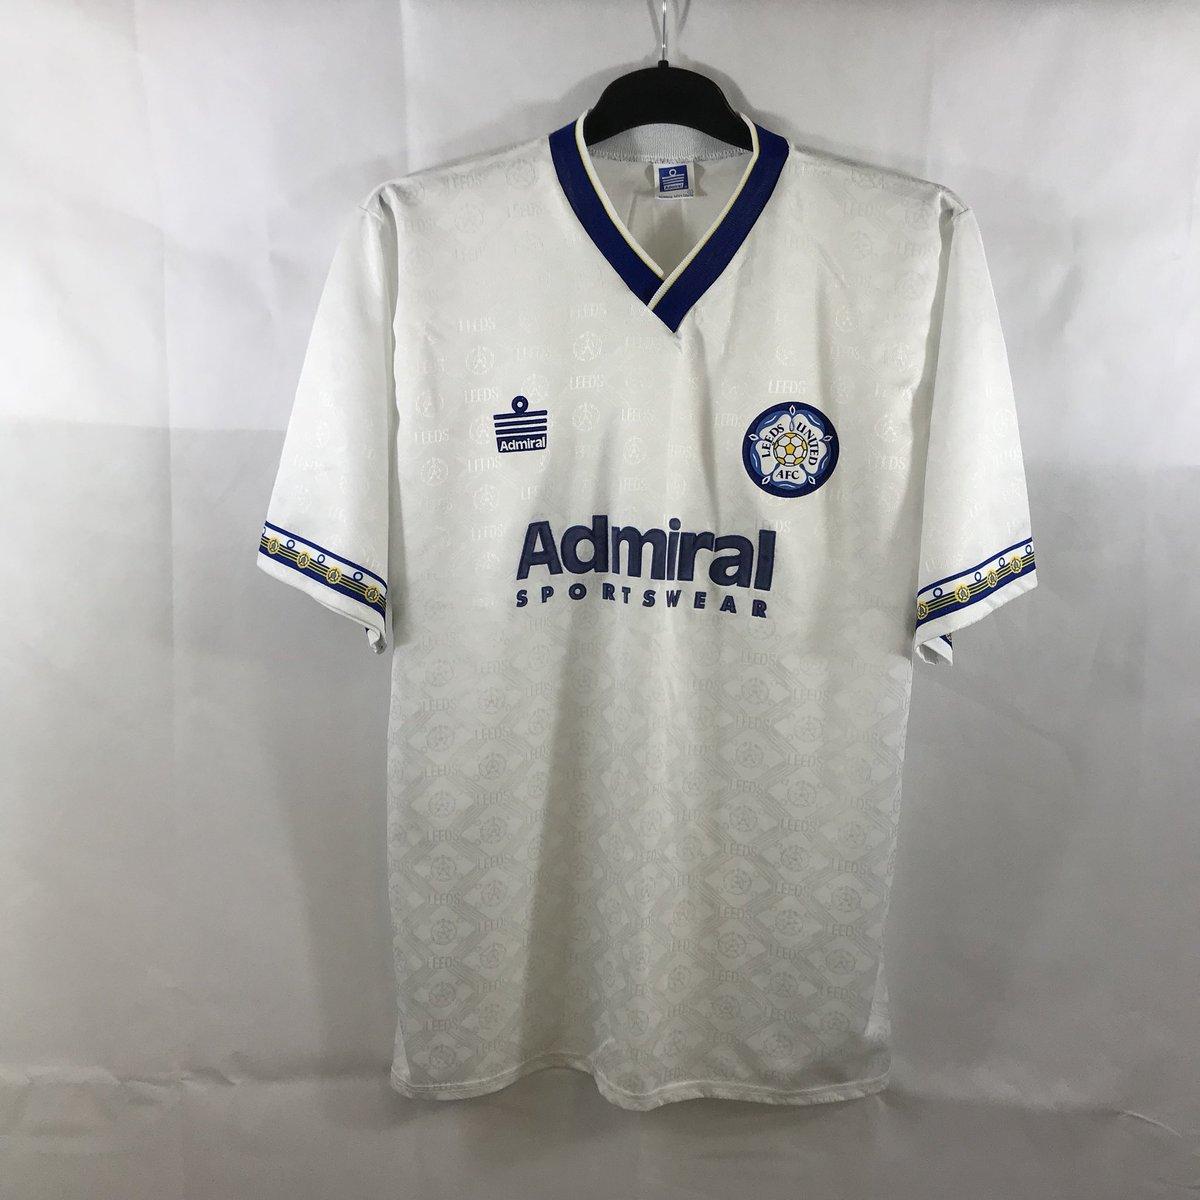 001e28a71 ... Shirt 1992 93 Adults Large Admiral  http   historicfootballshirts.co.uk shop leeds-united-home-football-shirt- 1992-93-adults-large-admiral  …